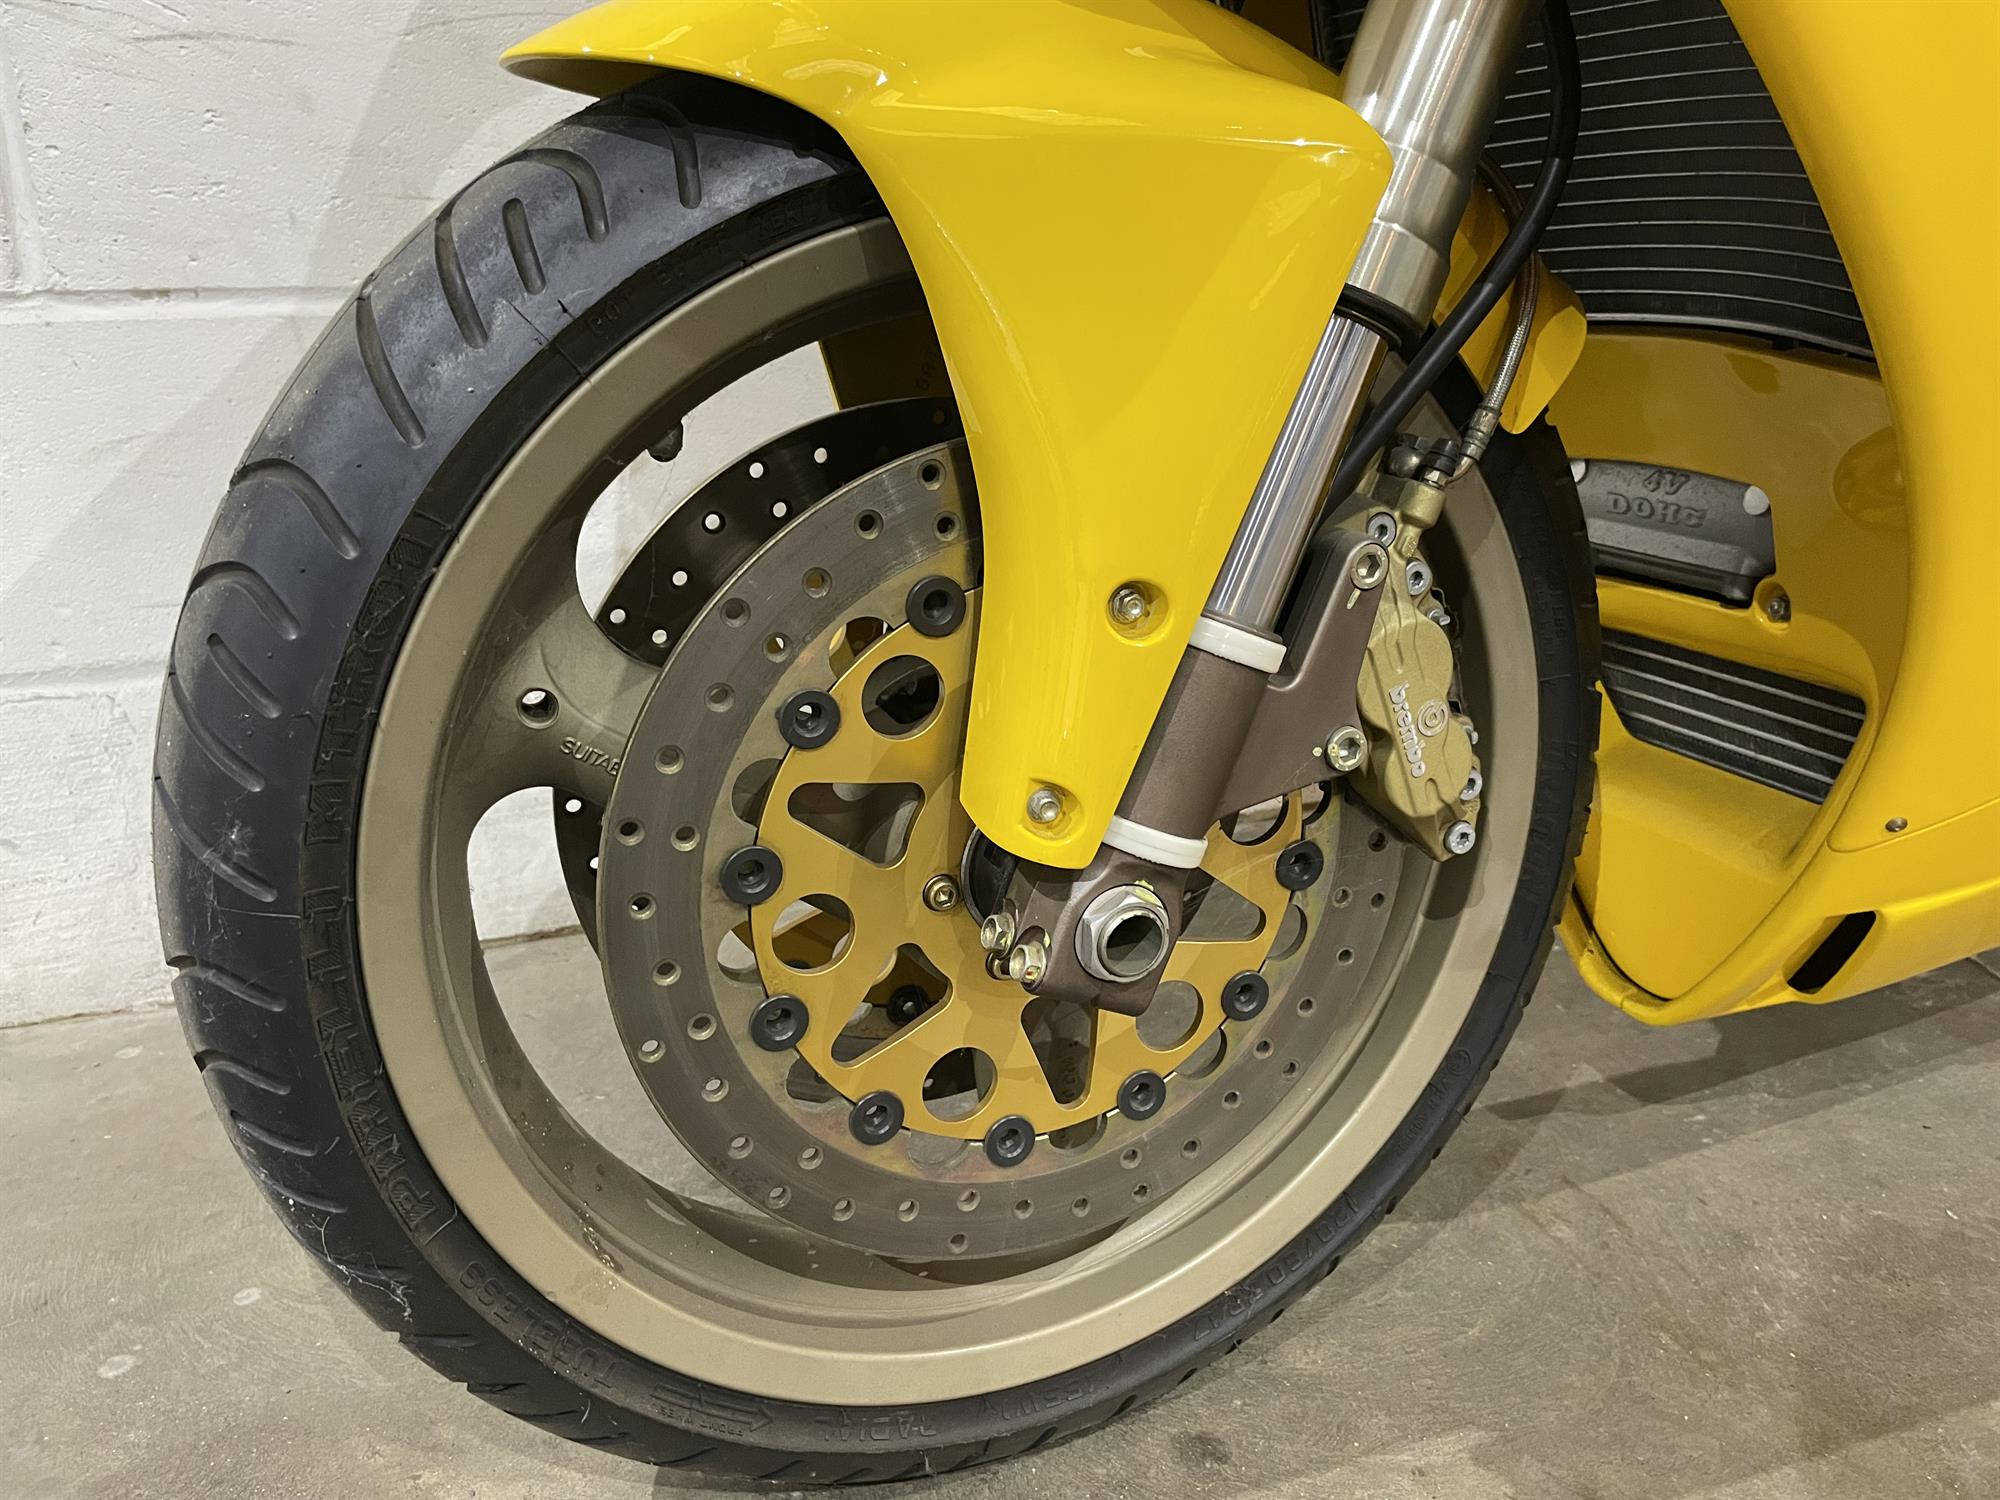 1998 Ducati 748 SPS - Image 2 of 10